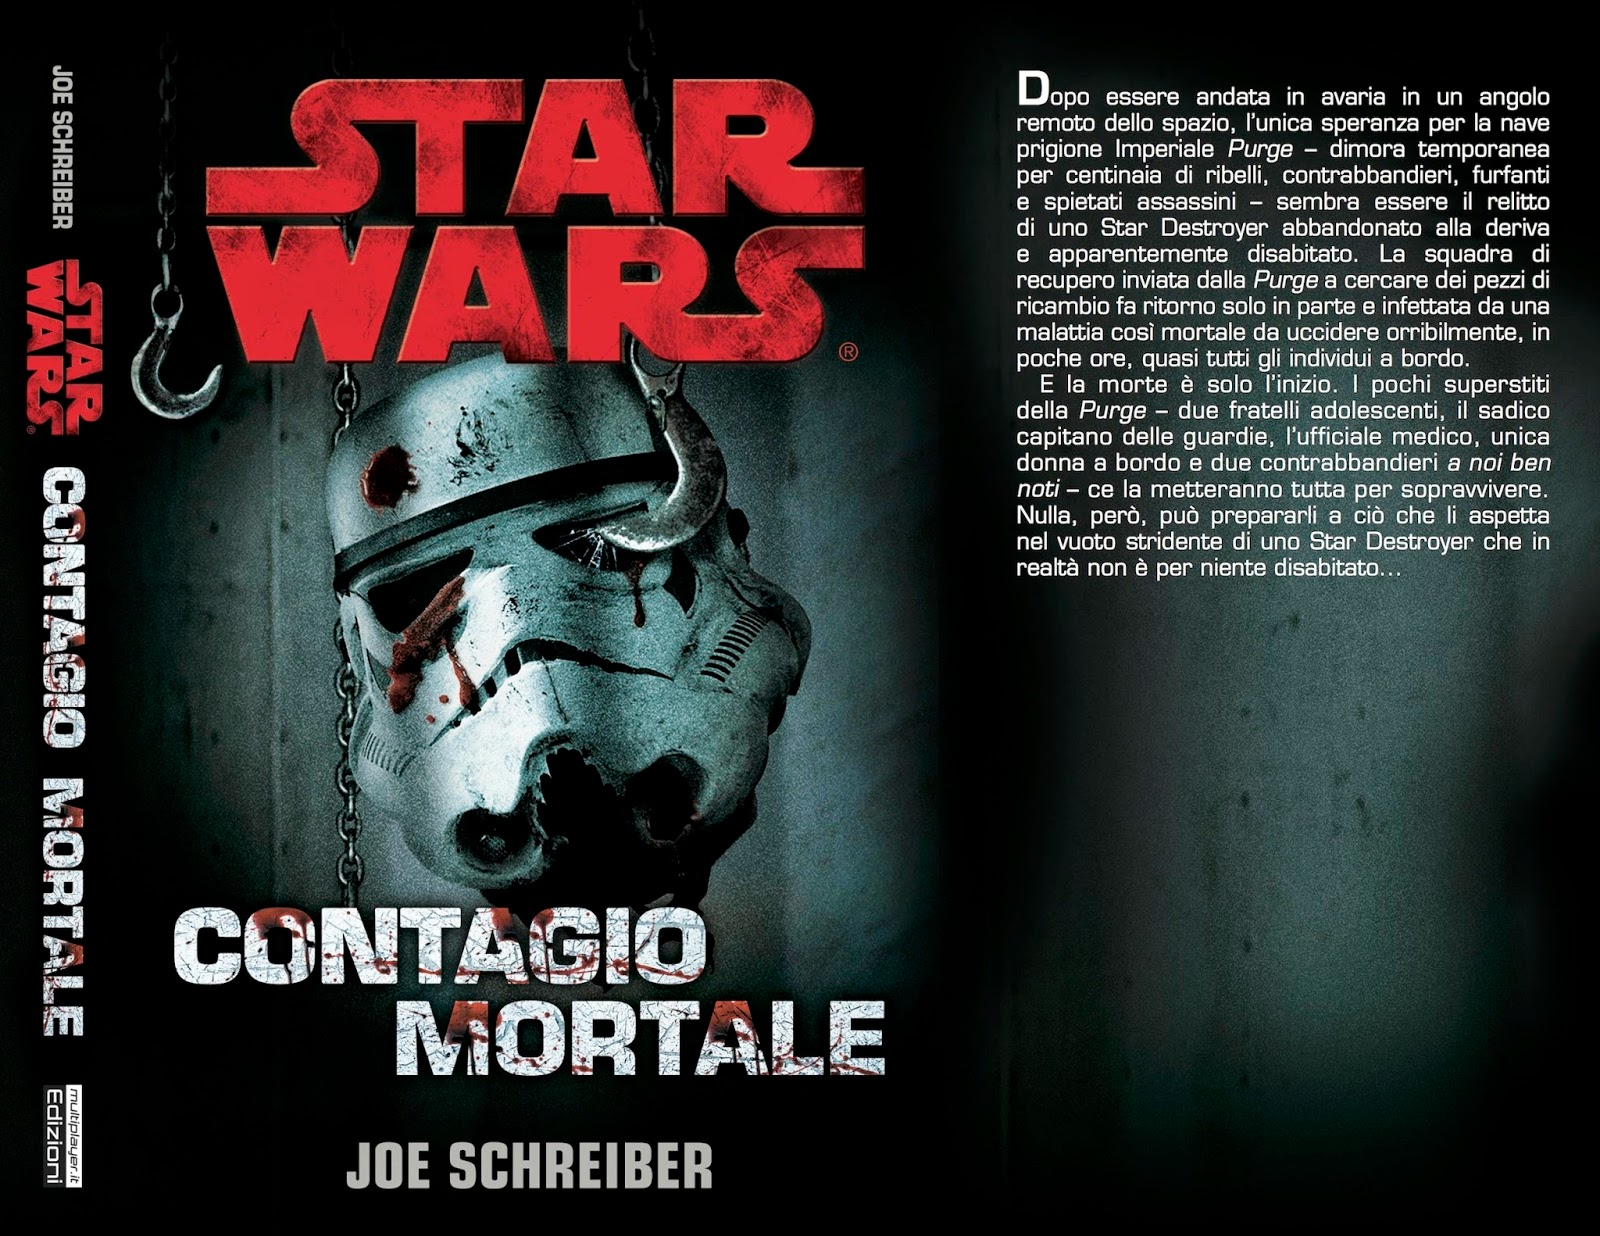 Star Wars Contagio Mortale (Joe Schreiber)